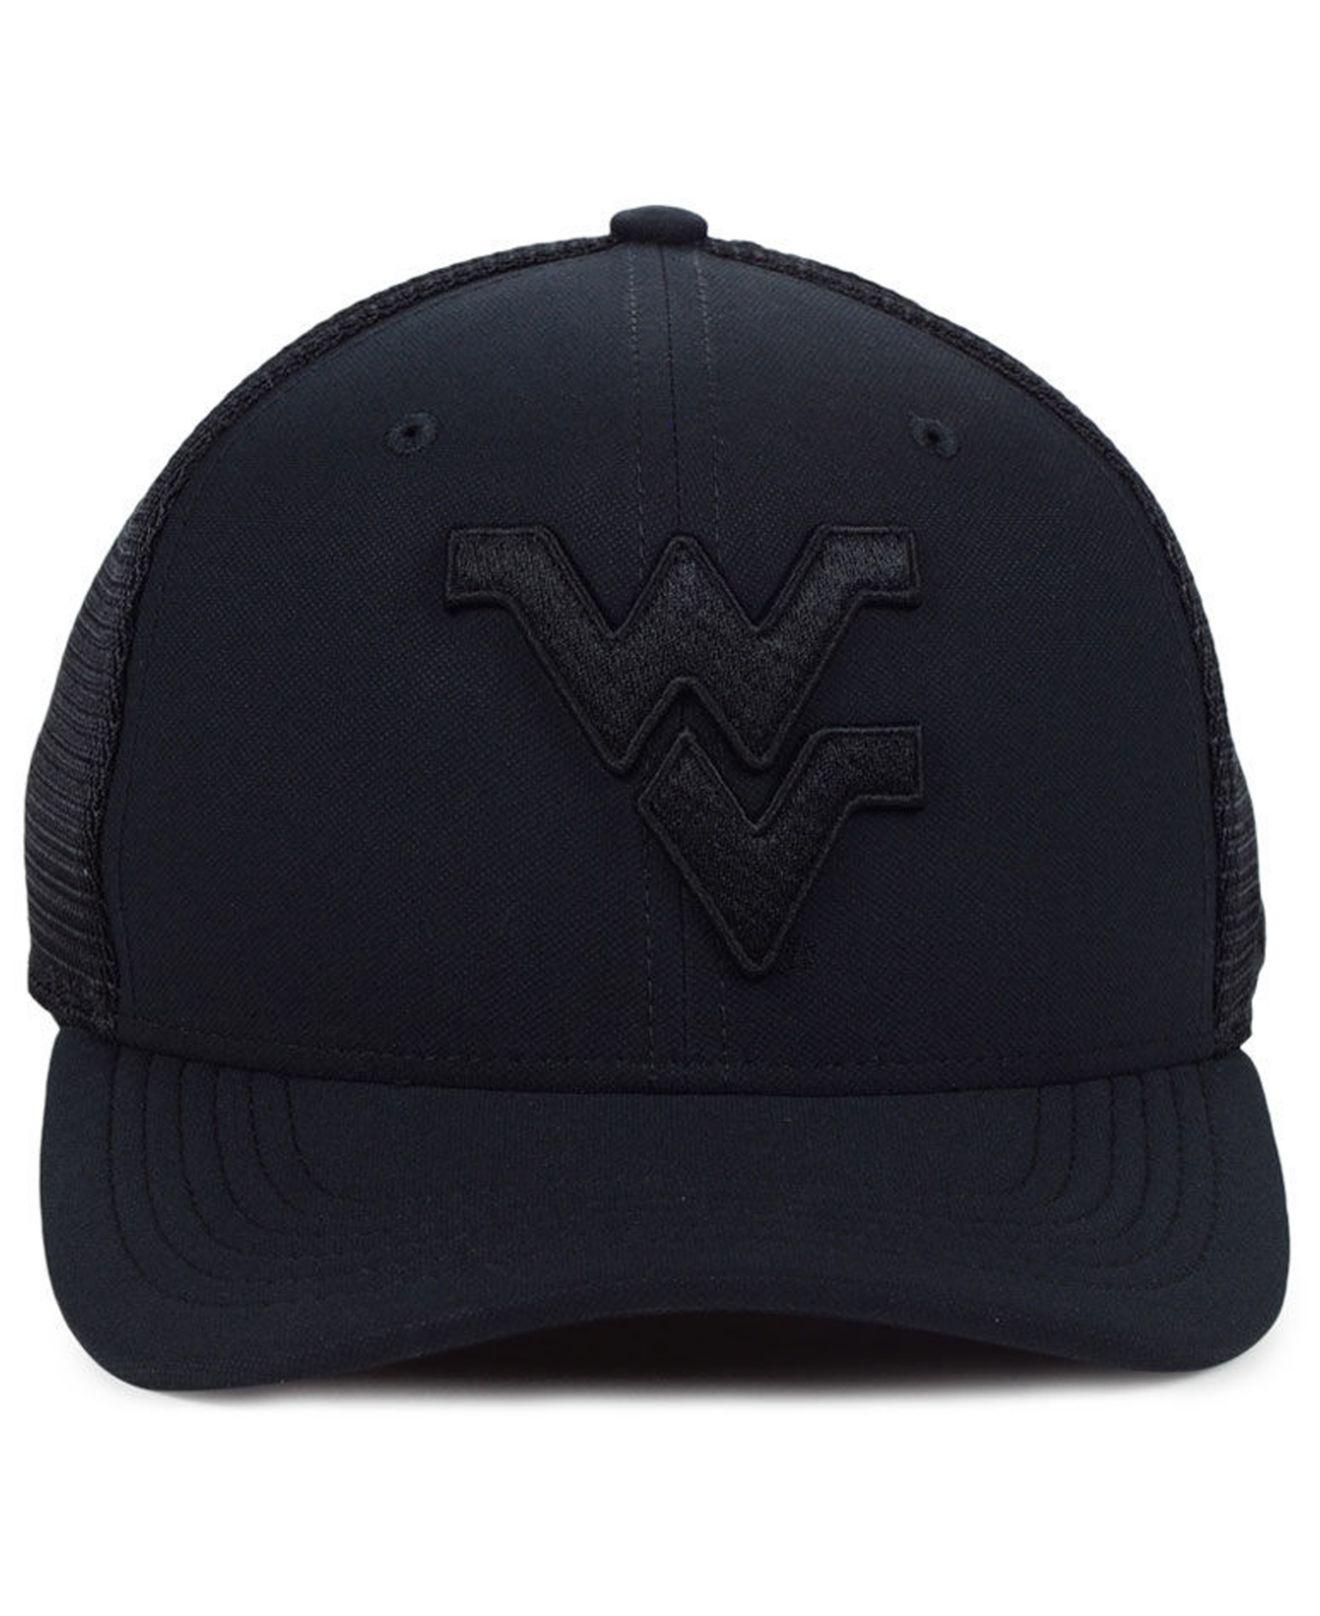 4e8349685d9 Lyst - Nike West Virginia Mountaineers Aerobill Black Swoosh Cap in Black  for Men